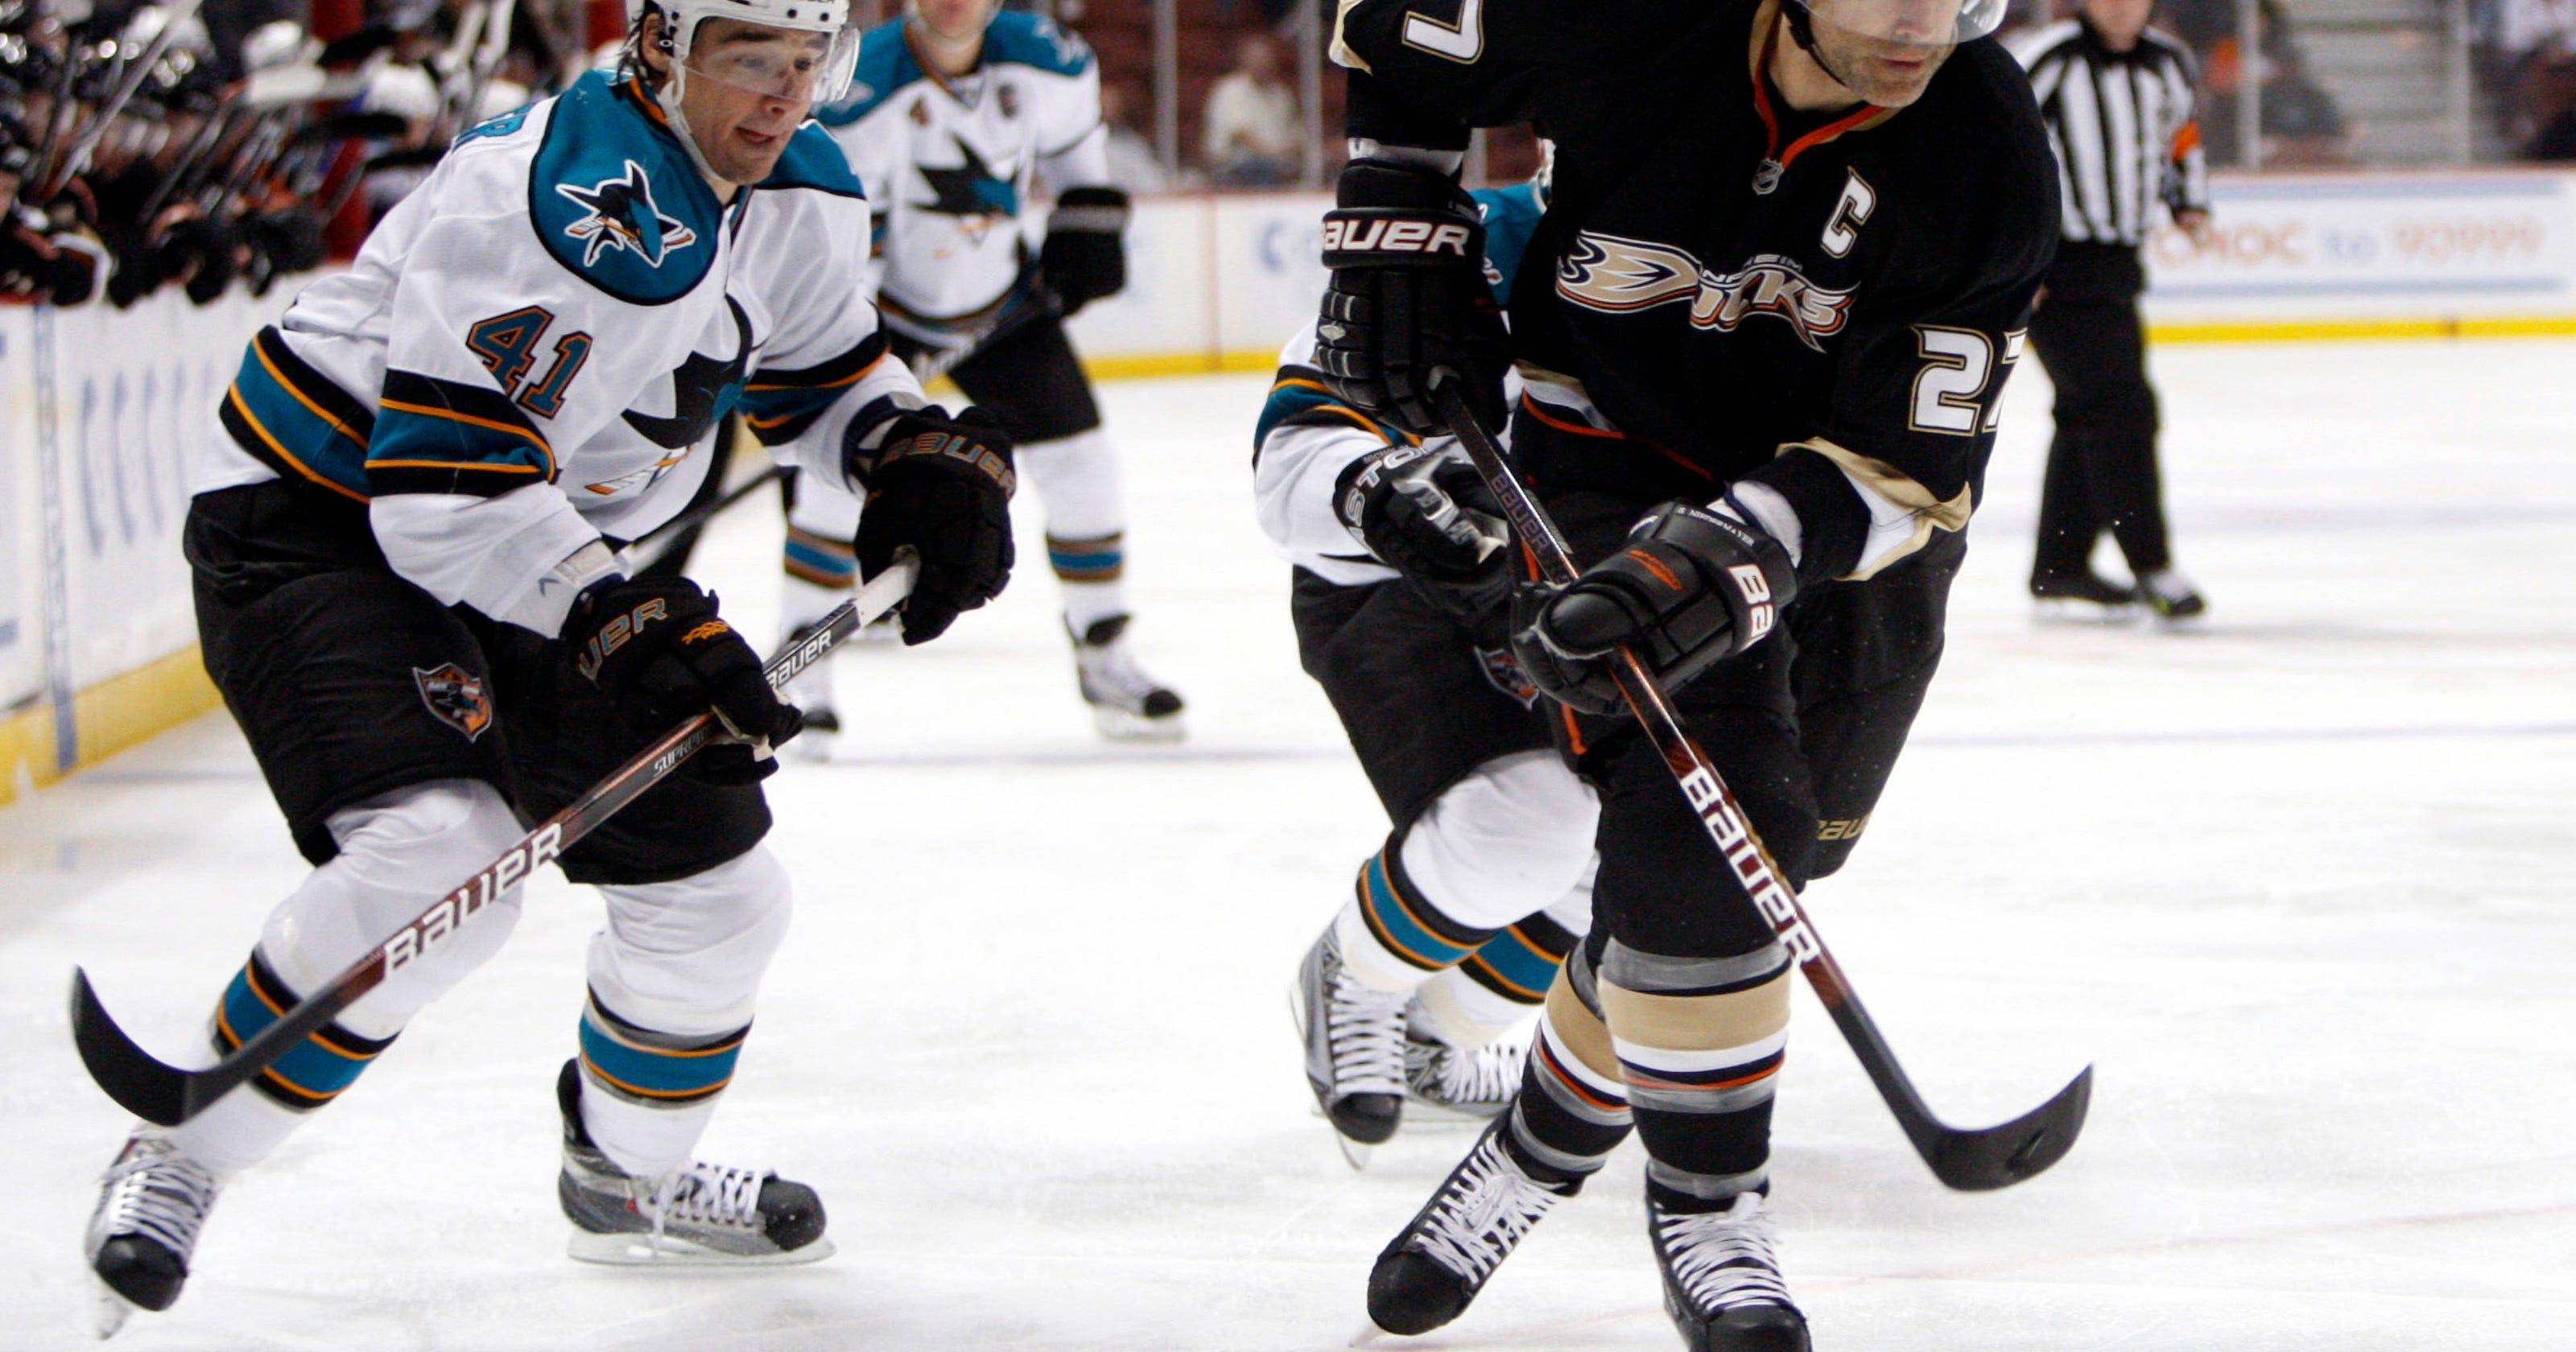 a2f15756163 Anaheim Ducks to retire numbers of Kariya, Niedermayer